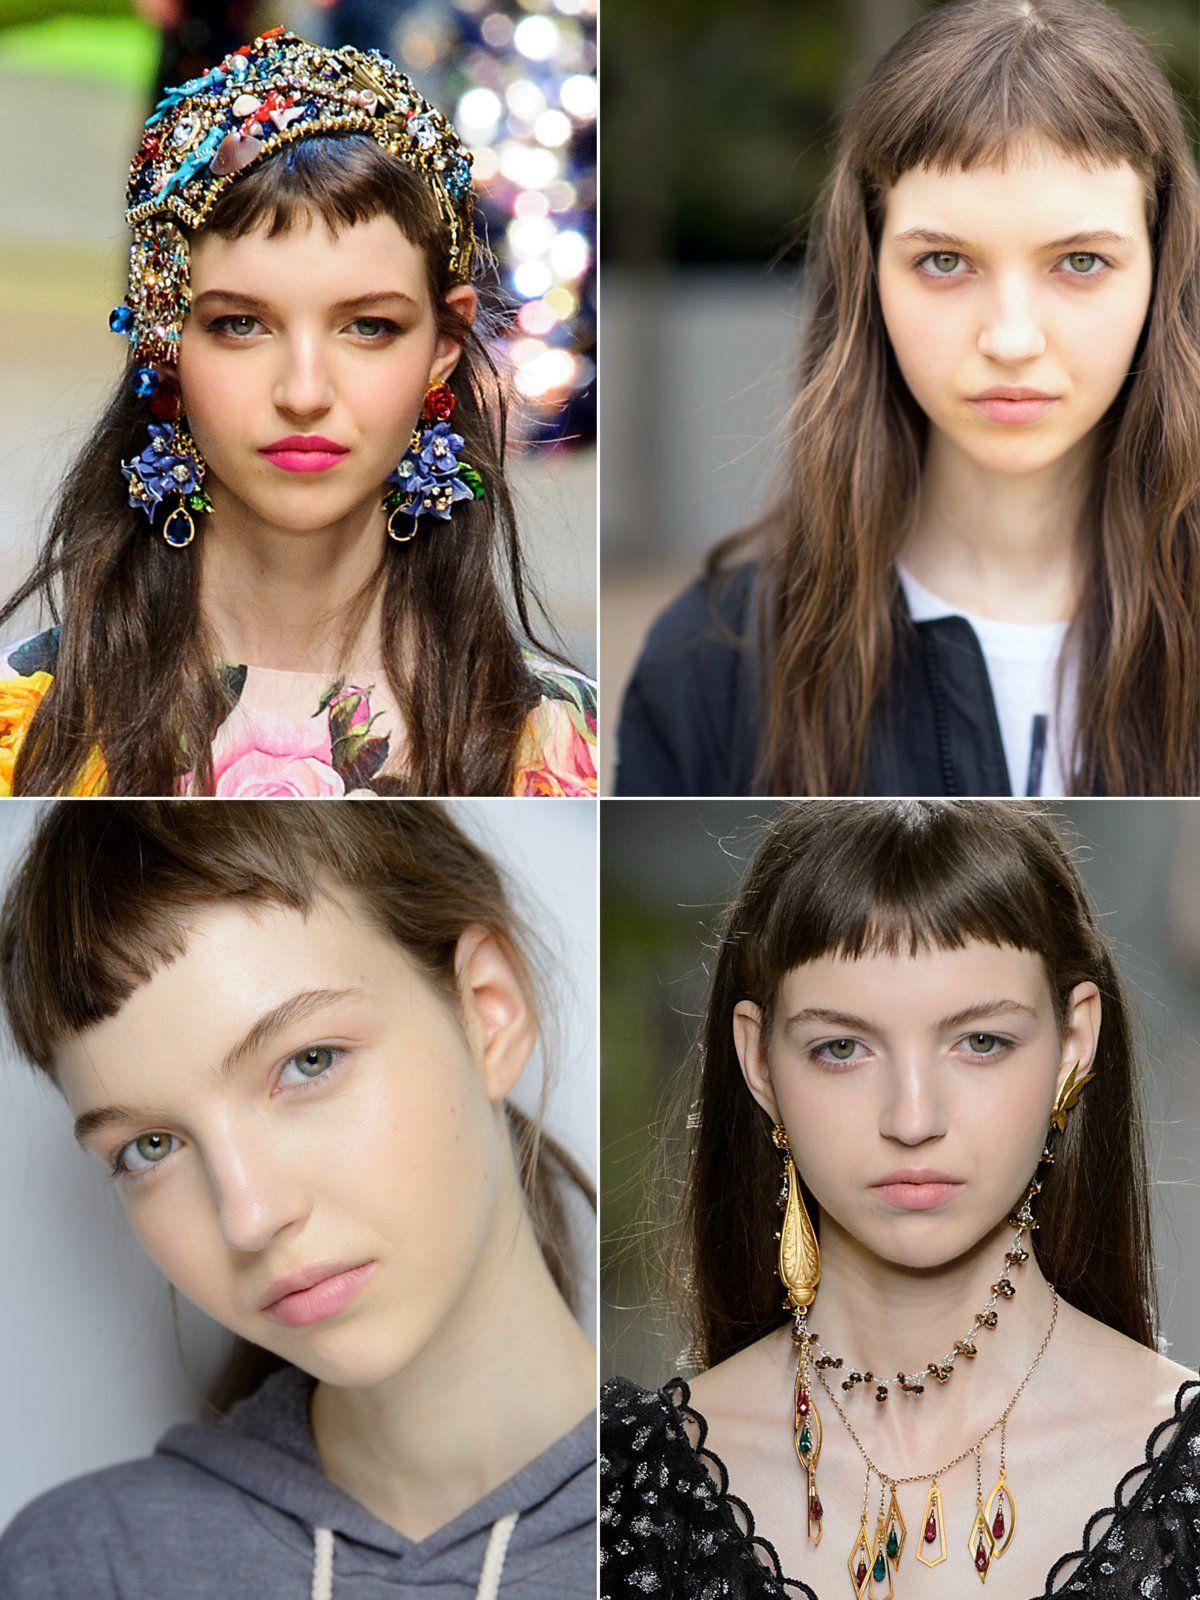 Medium Hairstyles With Bangs 2019 Female 94